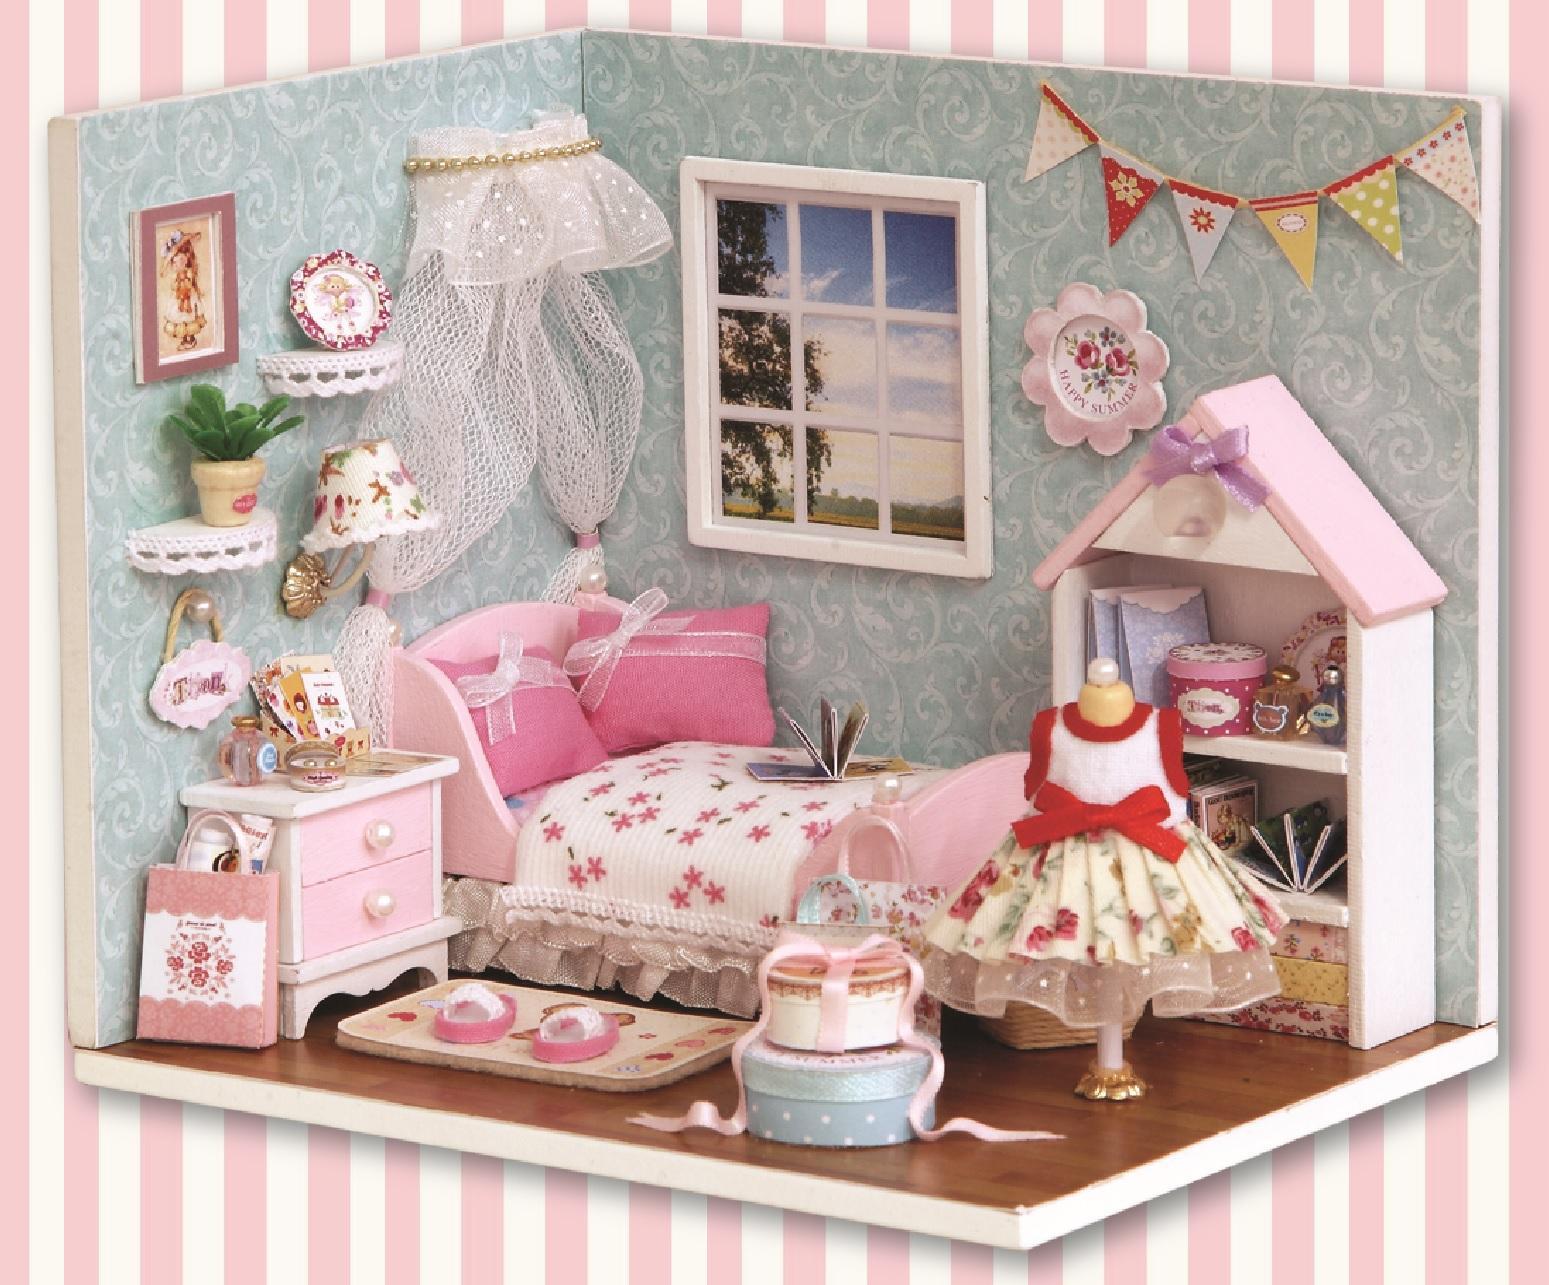 DIY Miniature Happy Pink Bedroom Dollhouse